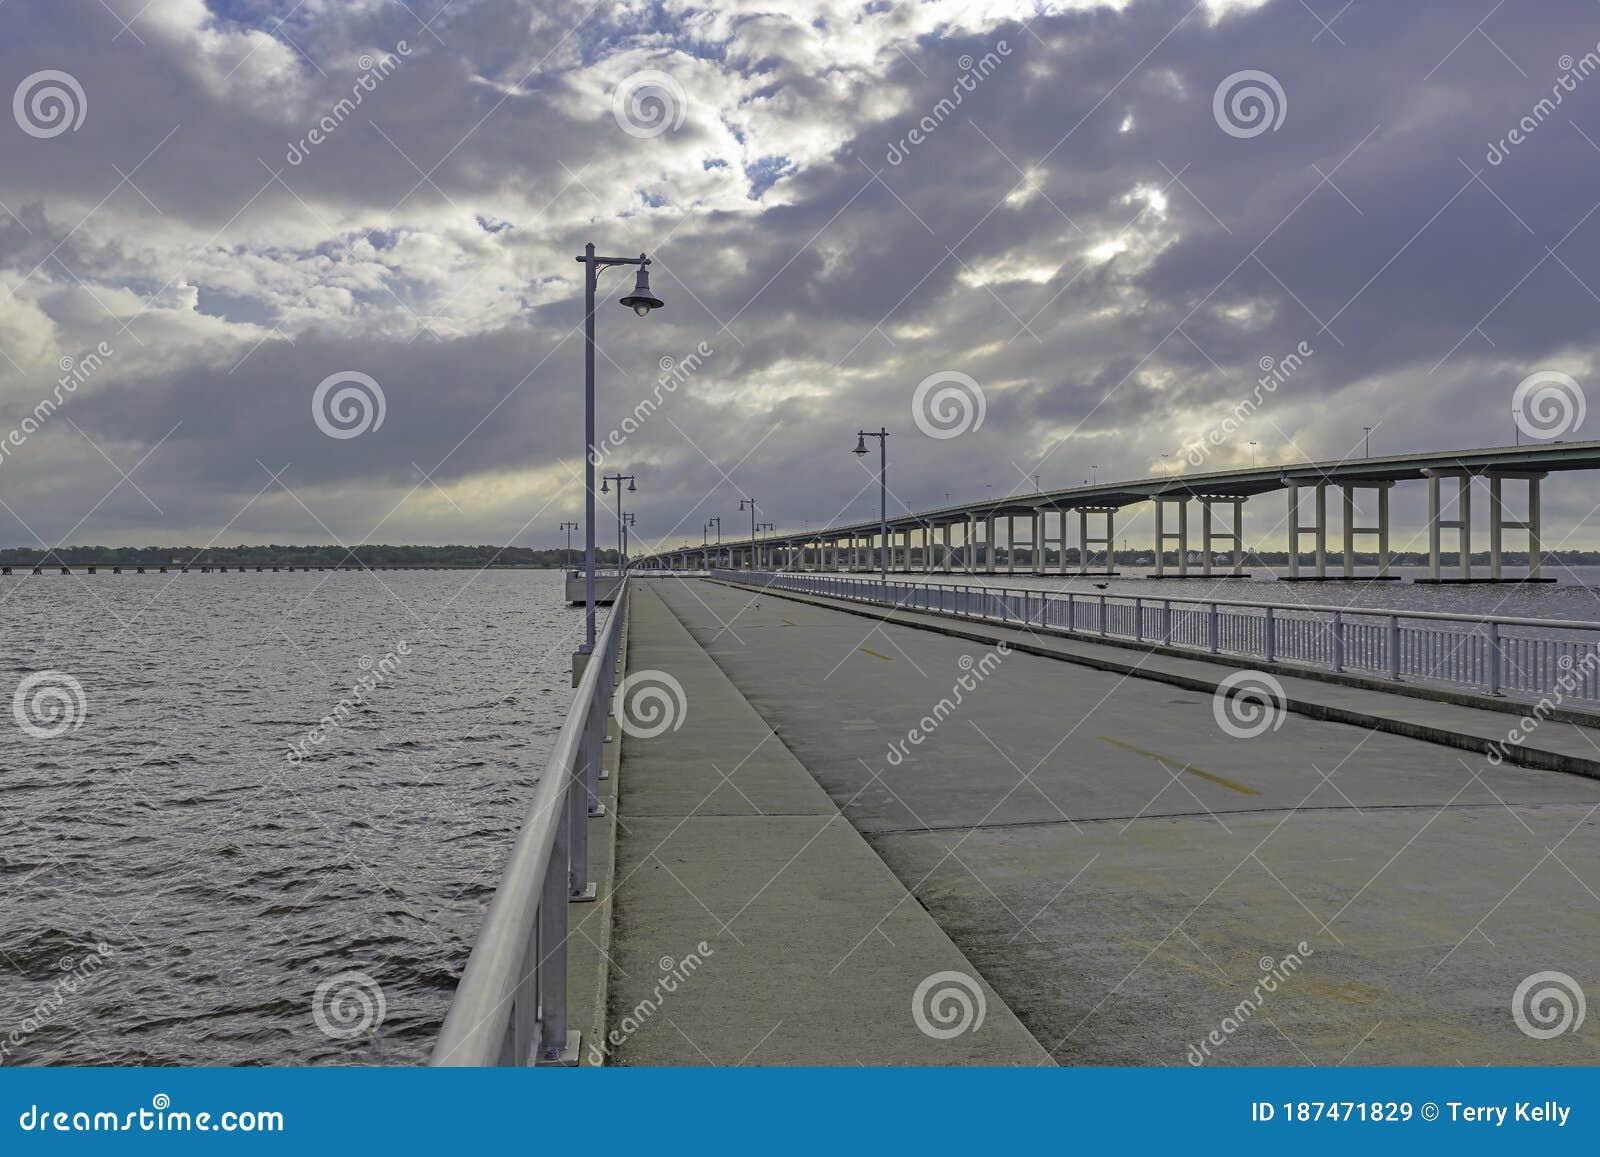 Public Fishing Pier Biloxi Mississippi Stock Image Image Of Anchorage Cloudy 187471829